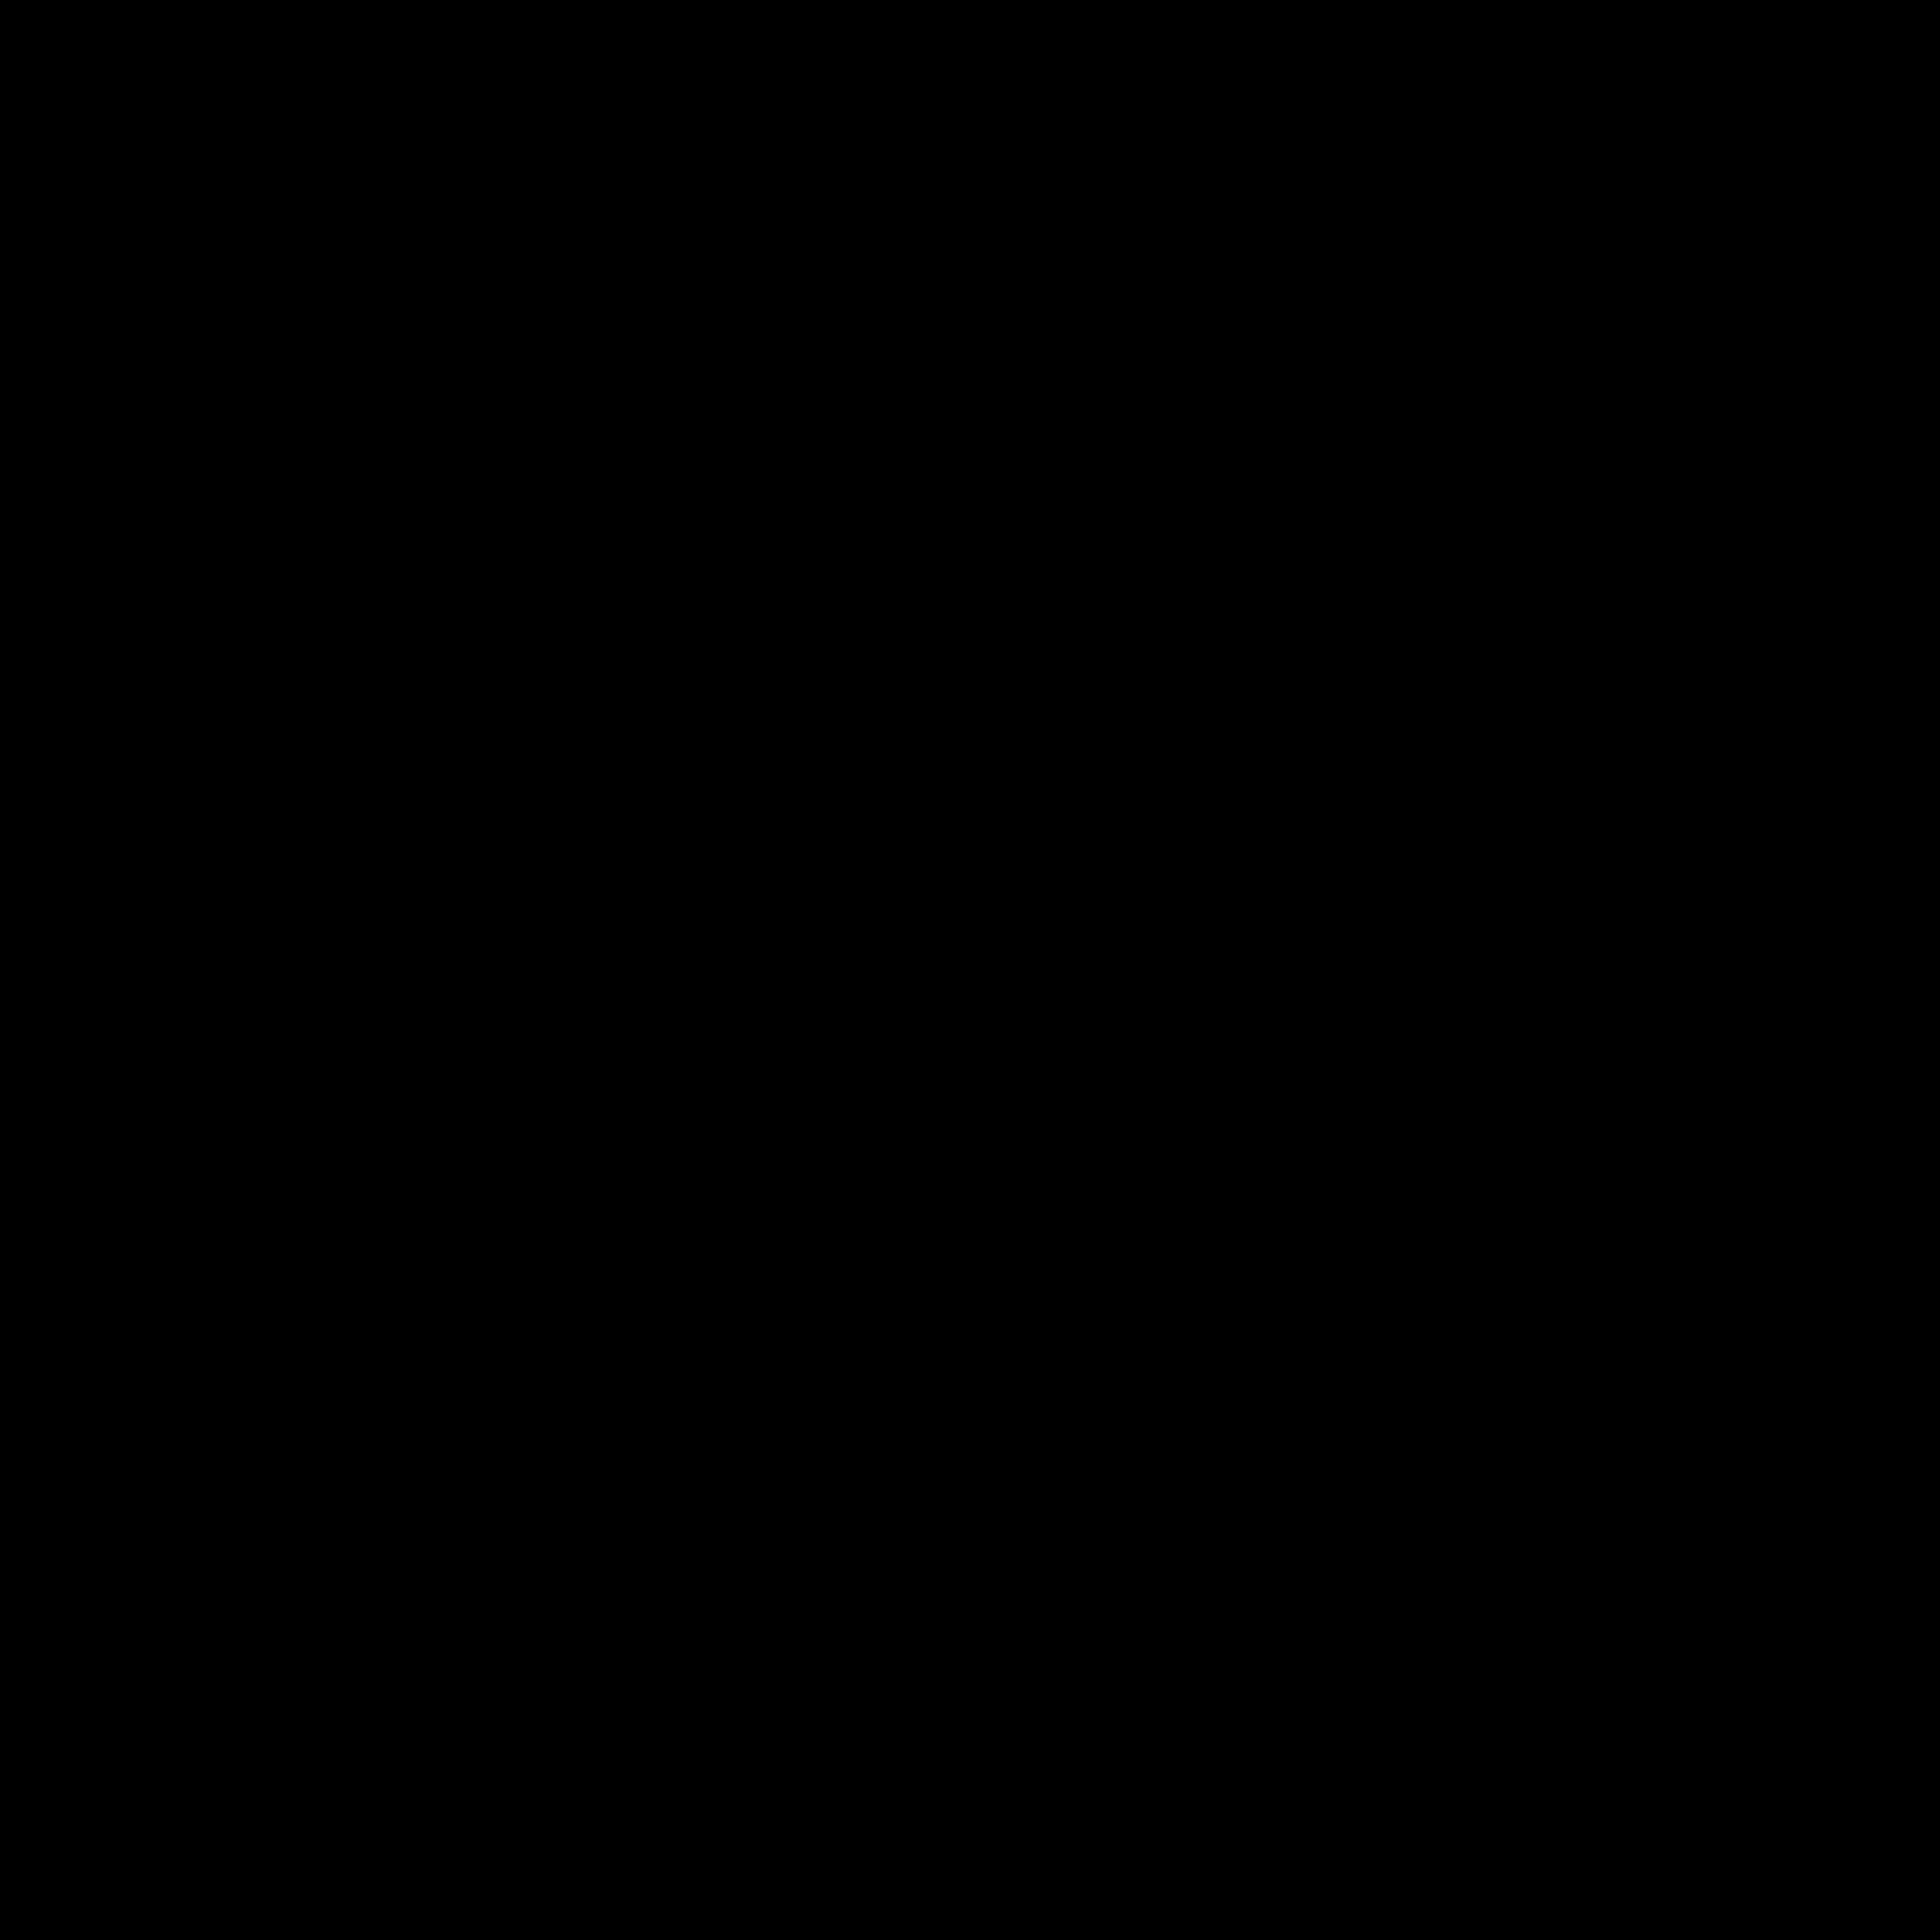 "TIM VANTOL – Minitour im Juli + Albumrelease ""Better Days"" (VÖ 22.05.2020)"